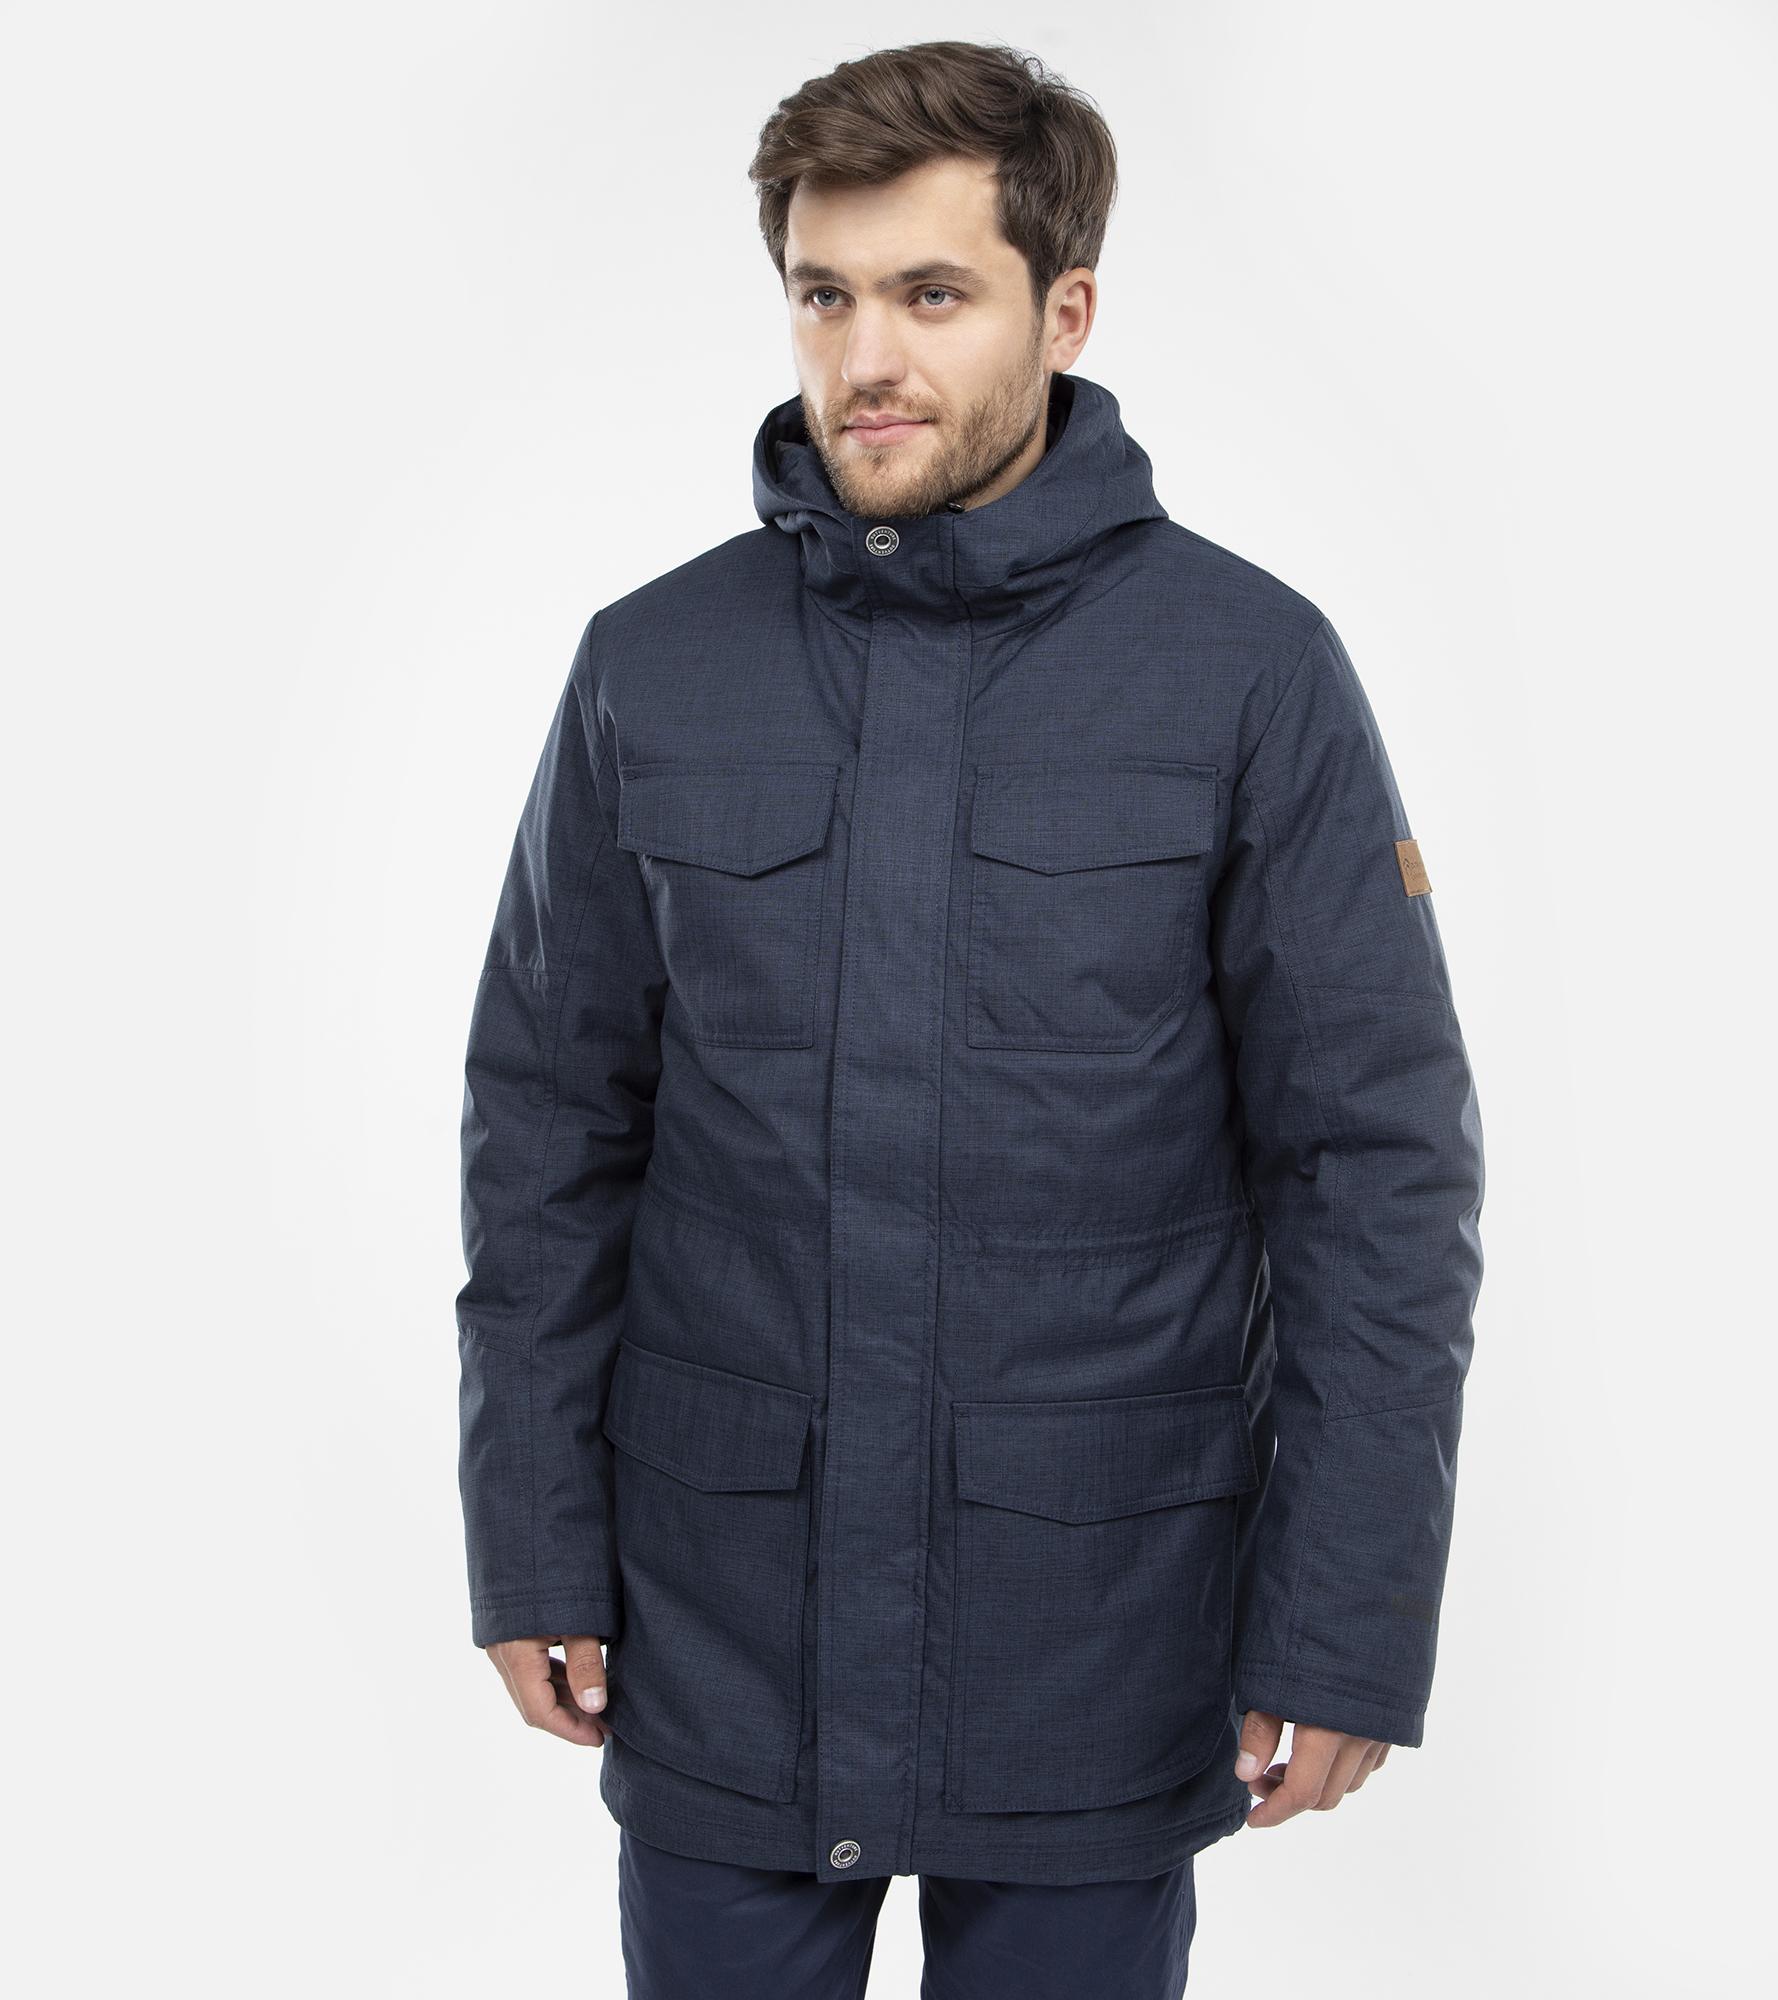 лучшая цена Outventure Куртка 3 в 1 мужская Outventure, размер 58